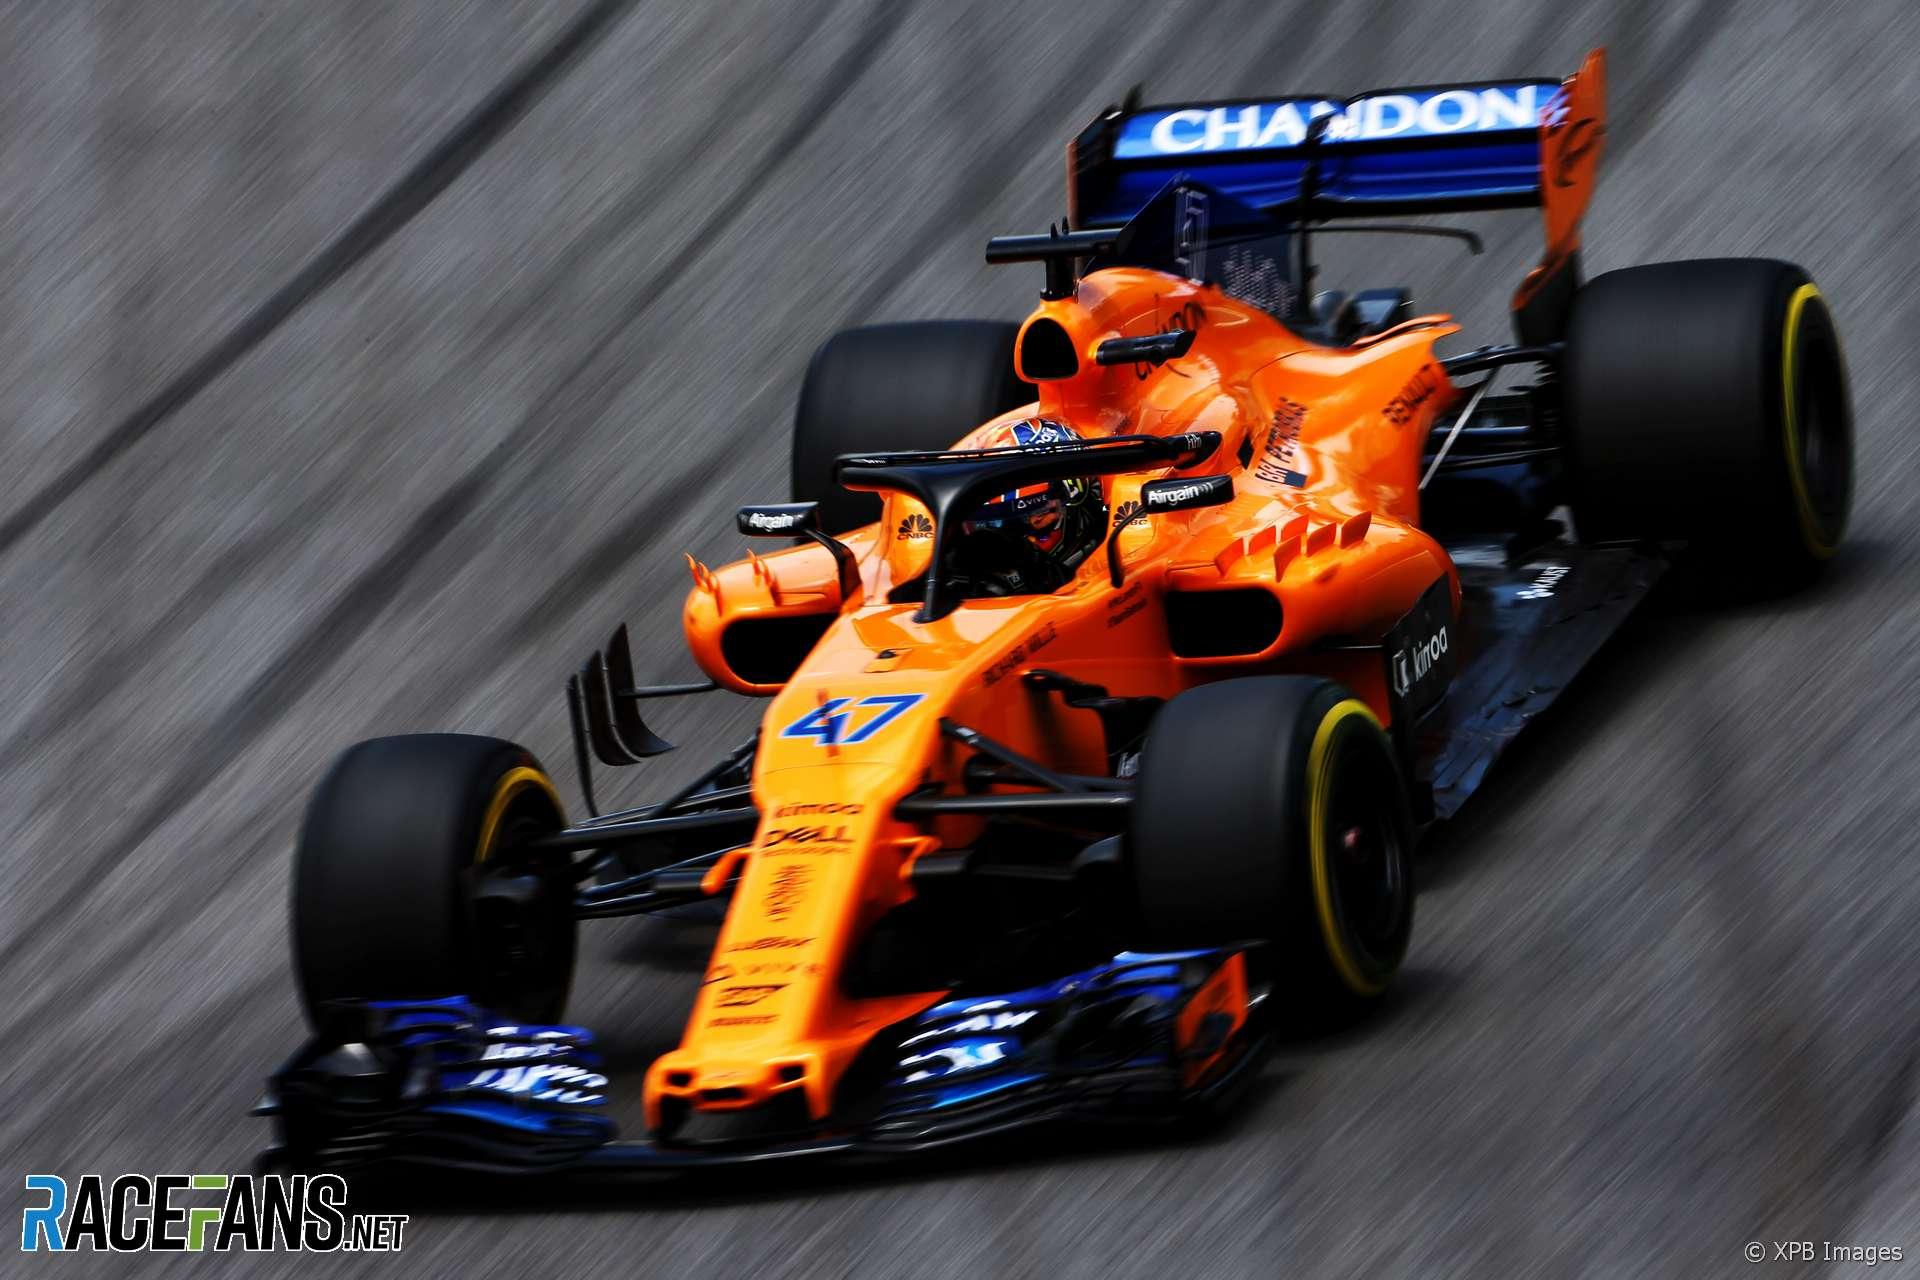 Lando Norris McLaren Interlagos 2018 RaceFans 1920x1280